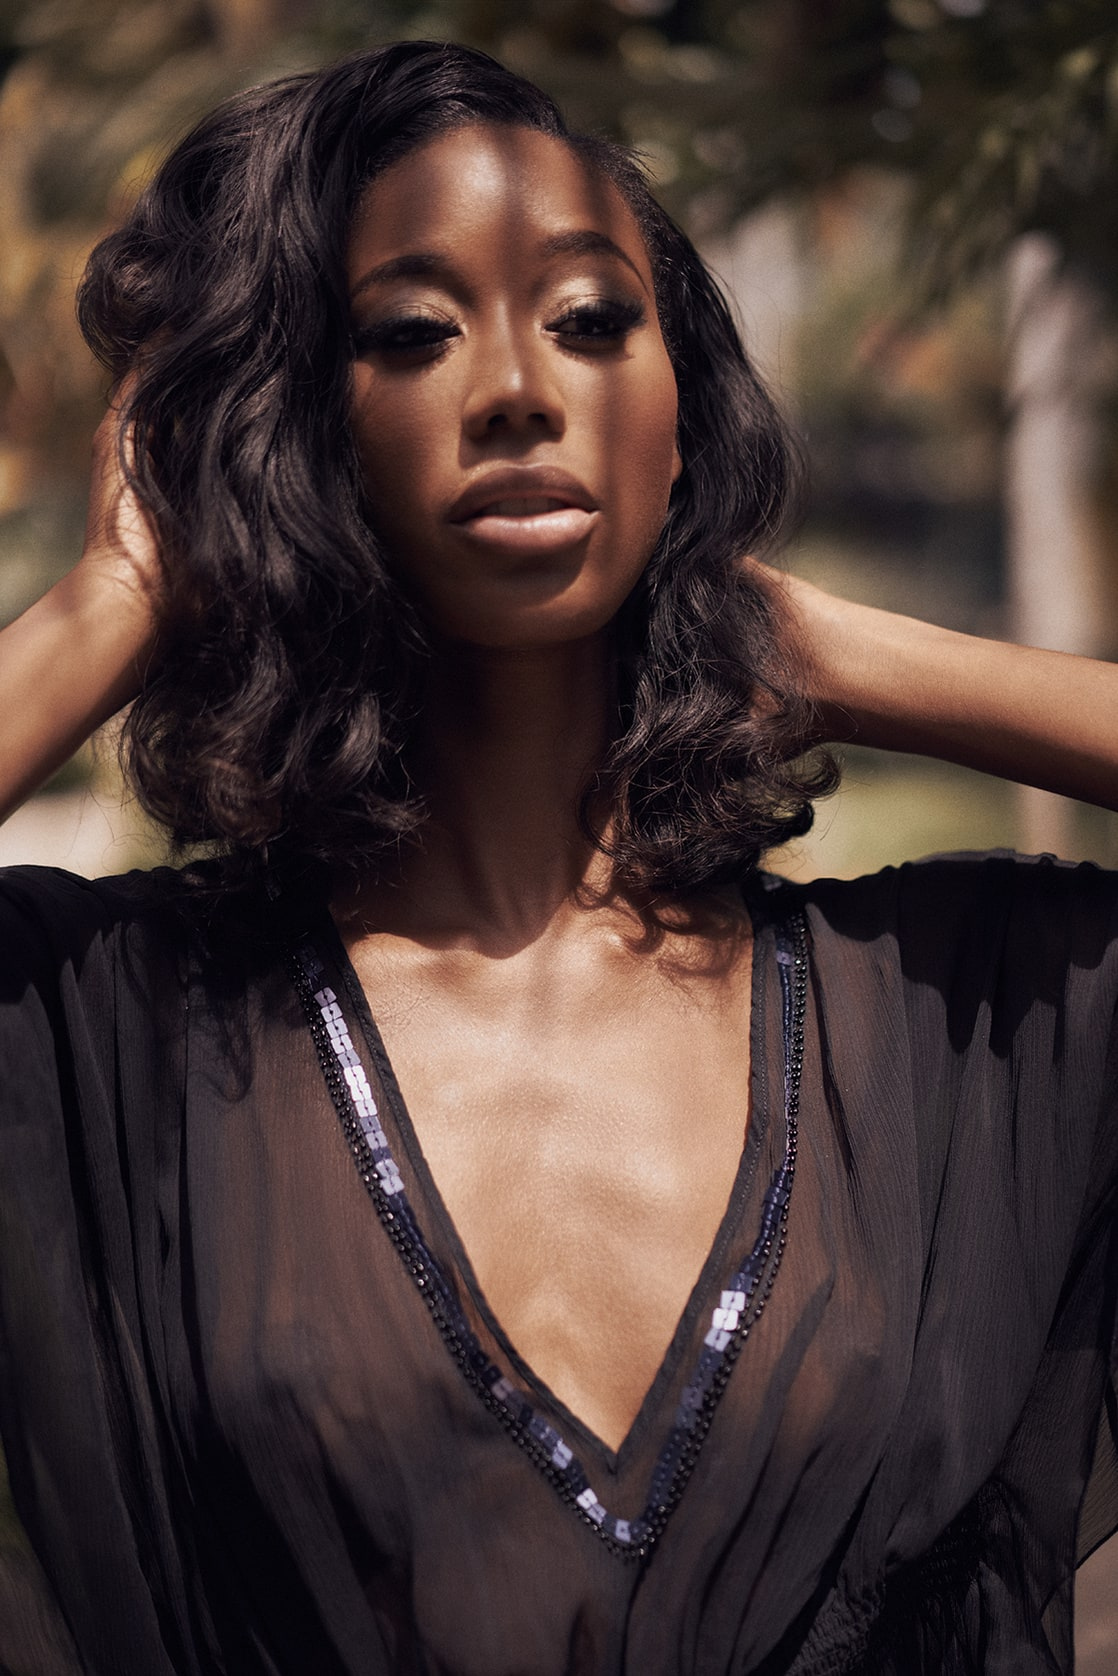 Leaked Jazzma Kendrick nudes (28 photos), Sexy, Sideboobs, Twitter, butt 2015